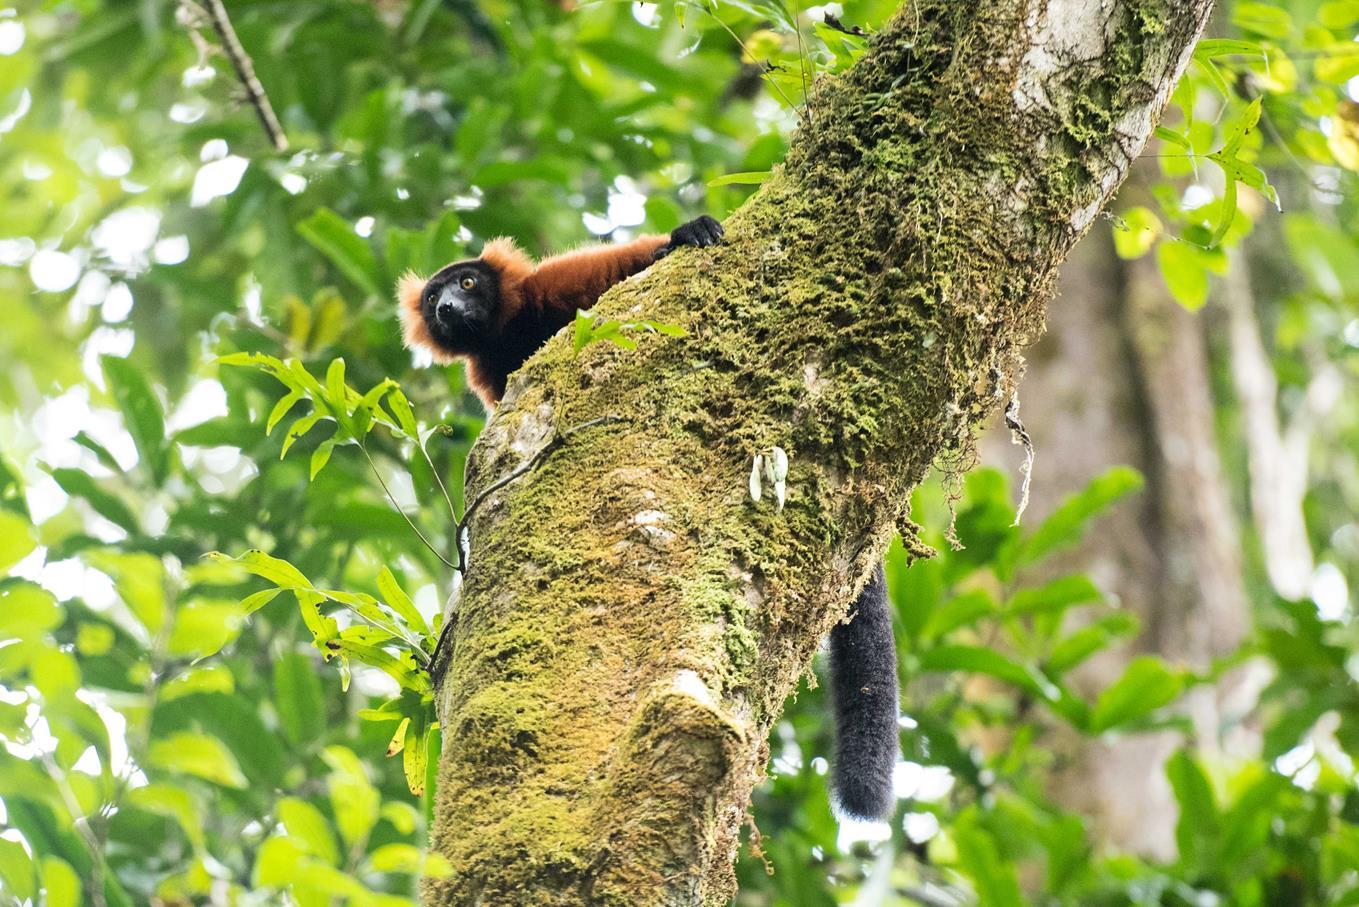 Red-Ruffed-Lemur-by-Simon-Bellingham-Copy